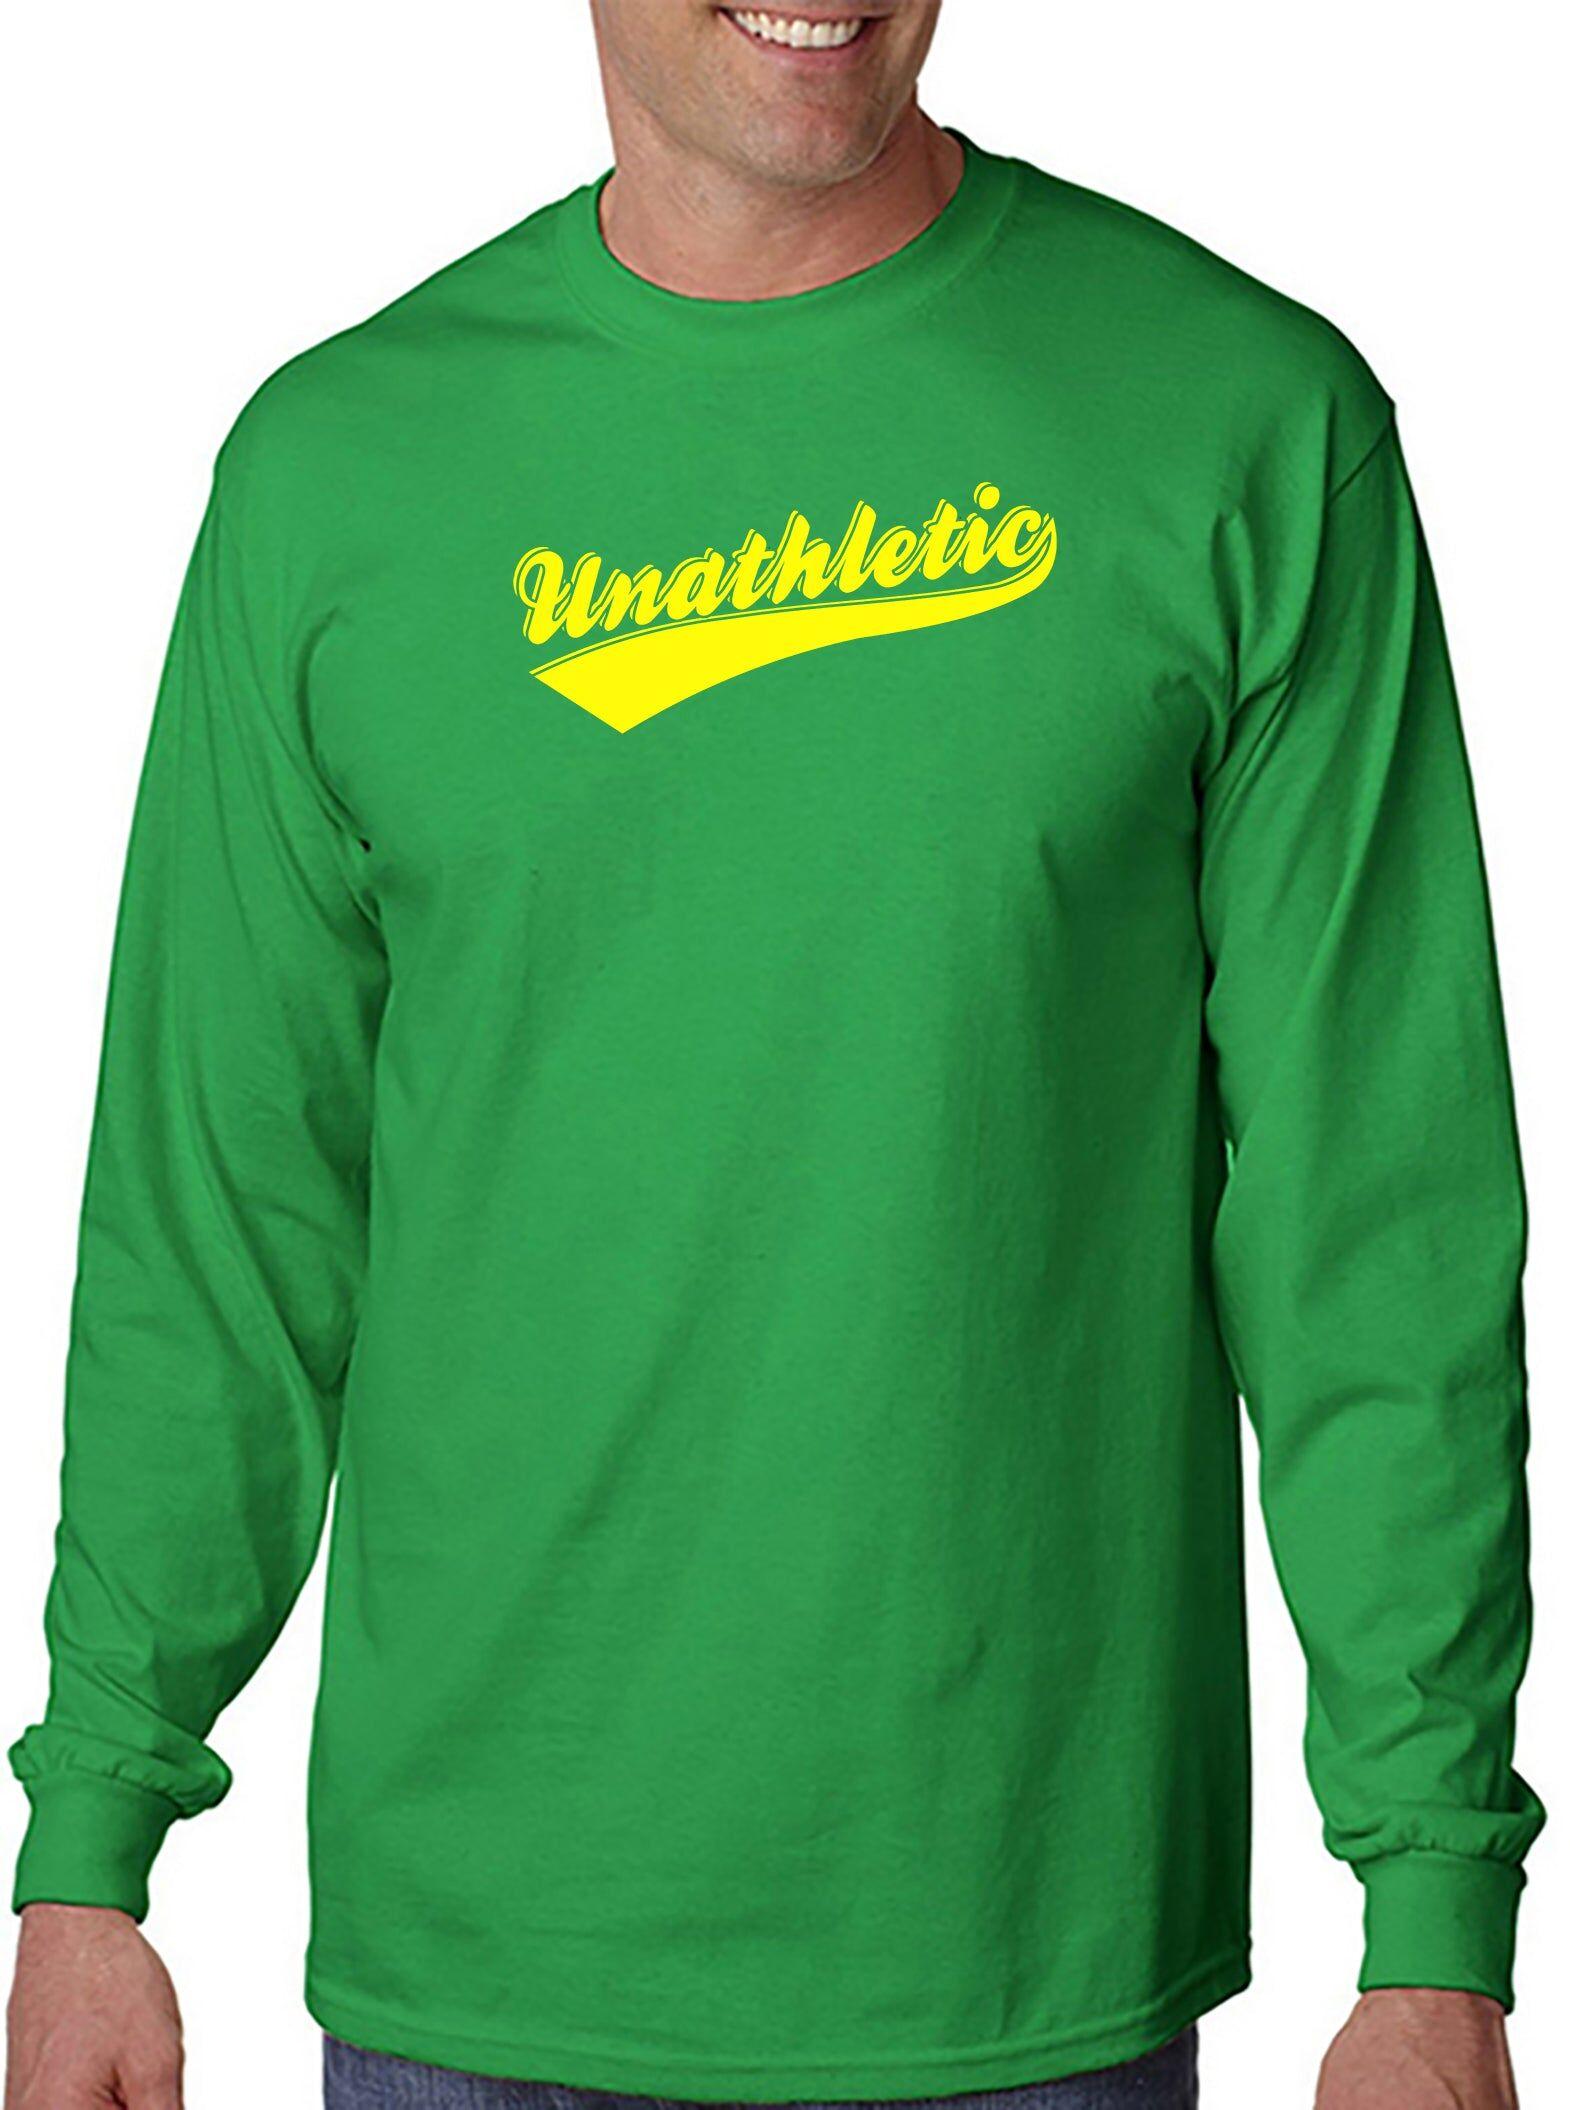 DesignerTeez Unathletic T-shirt